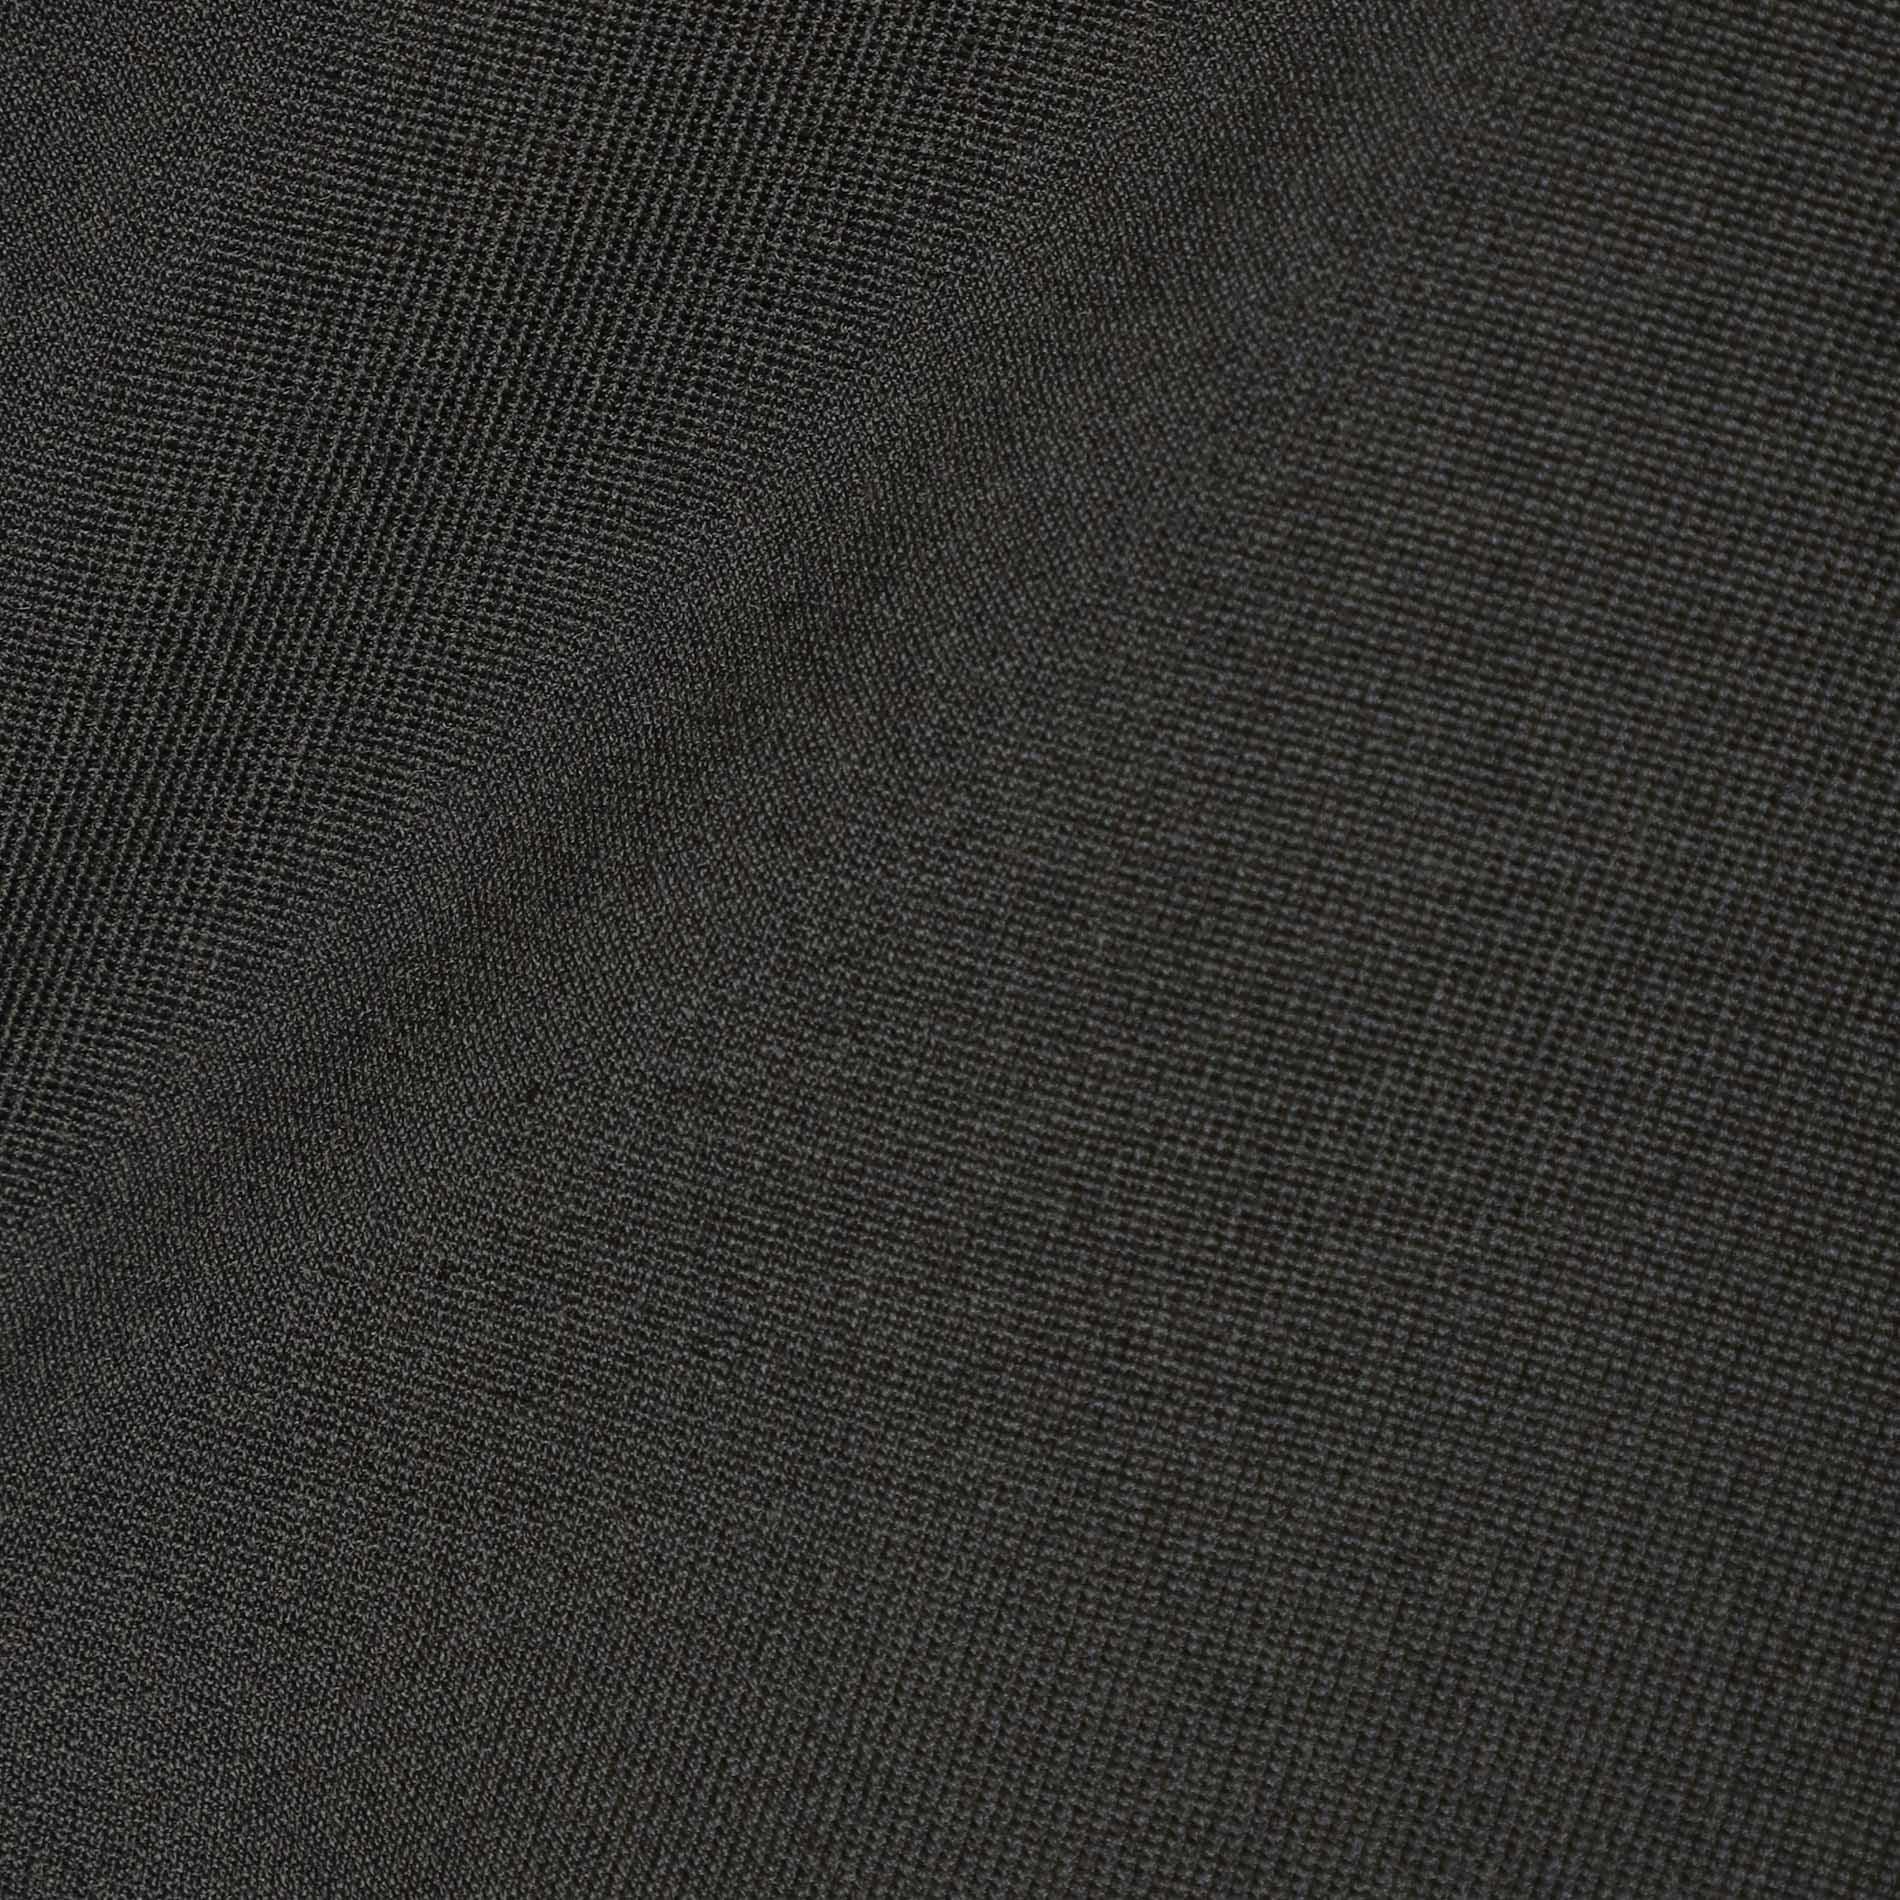 【Breasy Jacket】セットアップグレーツイルジャケット